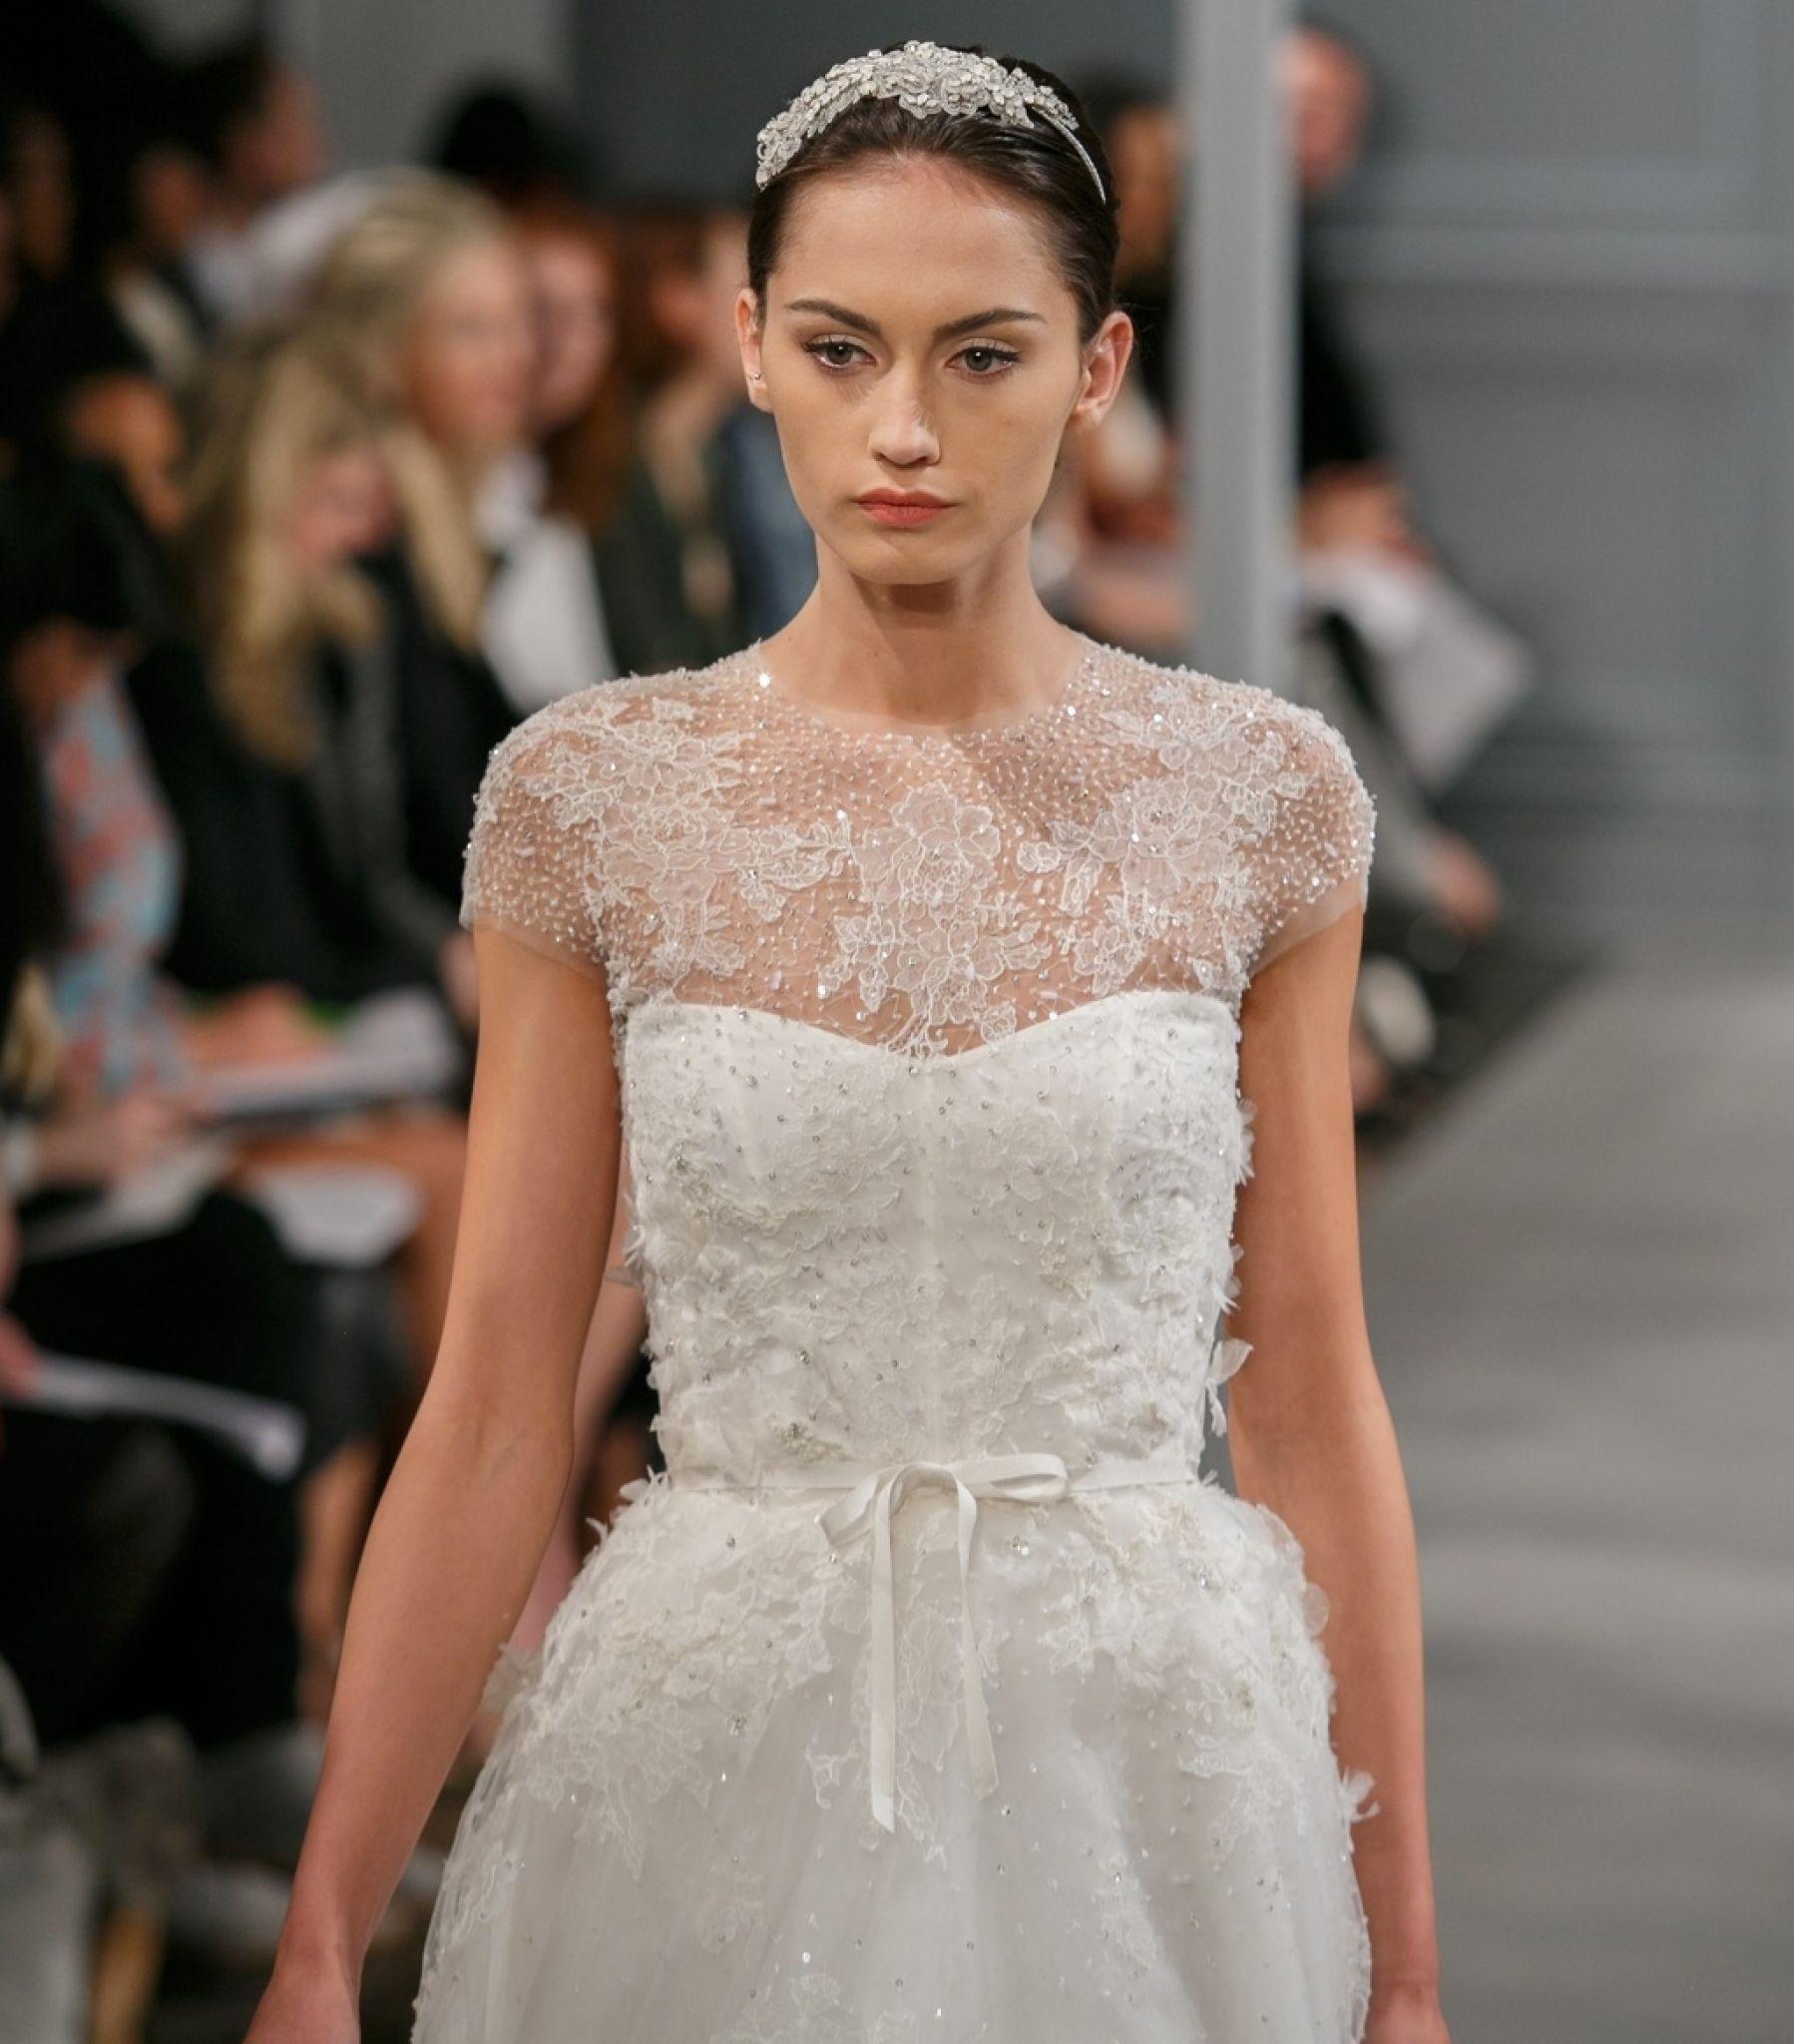 monique lhuillier wedding dresses prices - wedding dresses for the ...